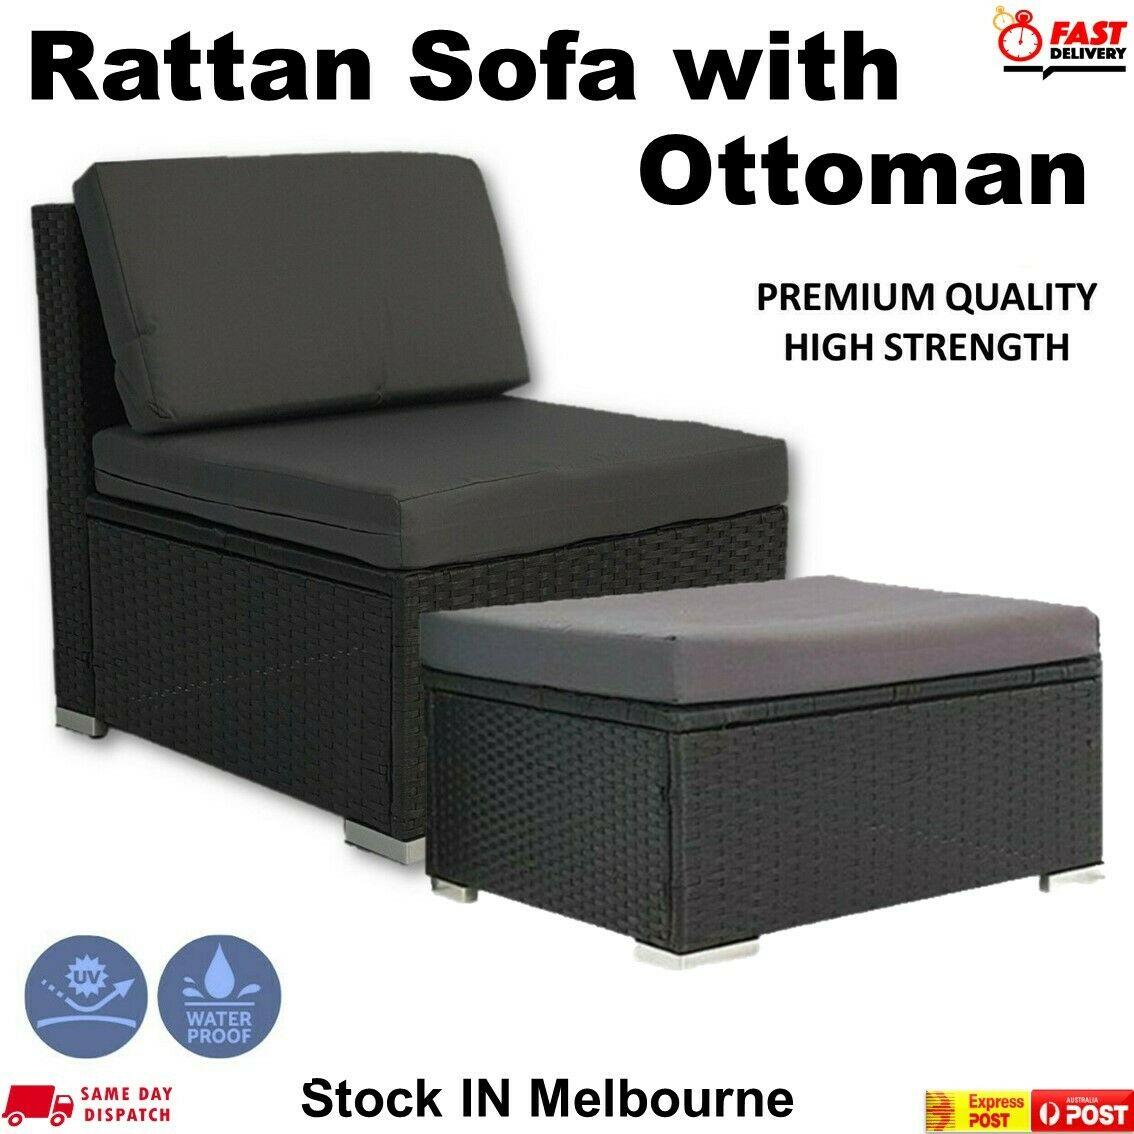 Garden Furniture - Outdoor Furniture Patio Rattan Middle Sofa & Ottoman Wicker Lounge Garden  Set